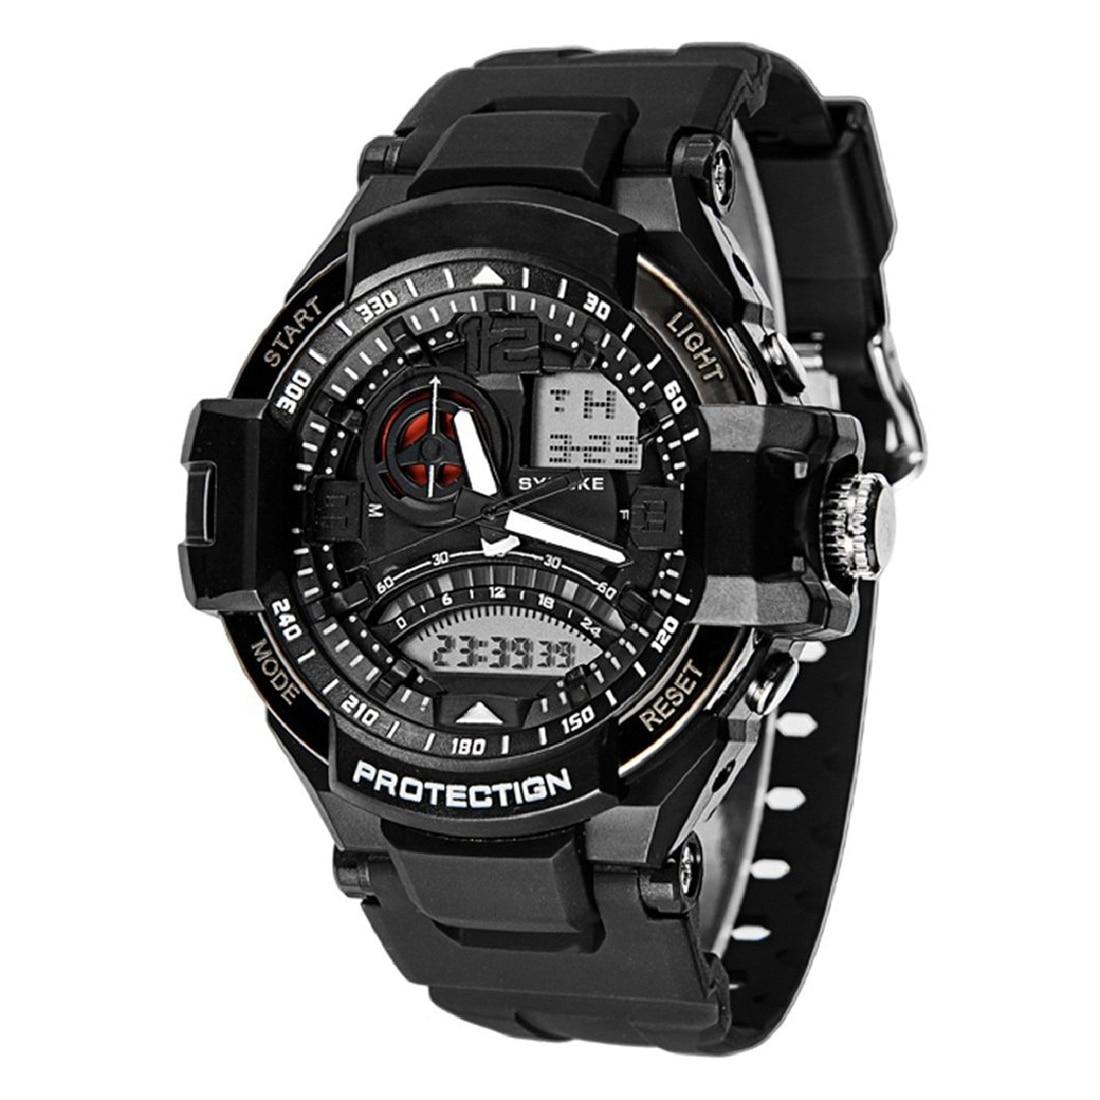 все цены на Practical SYNOKE New Men Watch Multifunction Digital Army Watch Quartz Watch Waterproof Watch онлайн